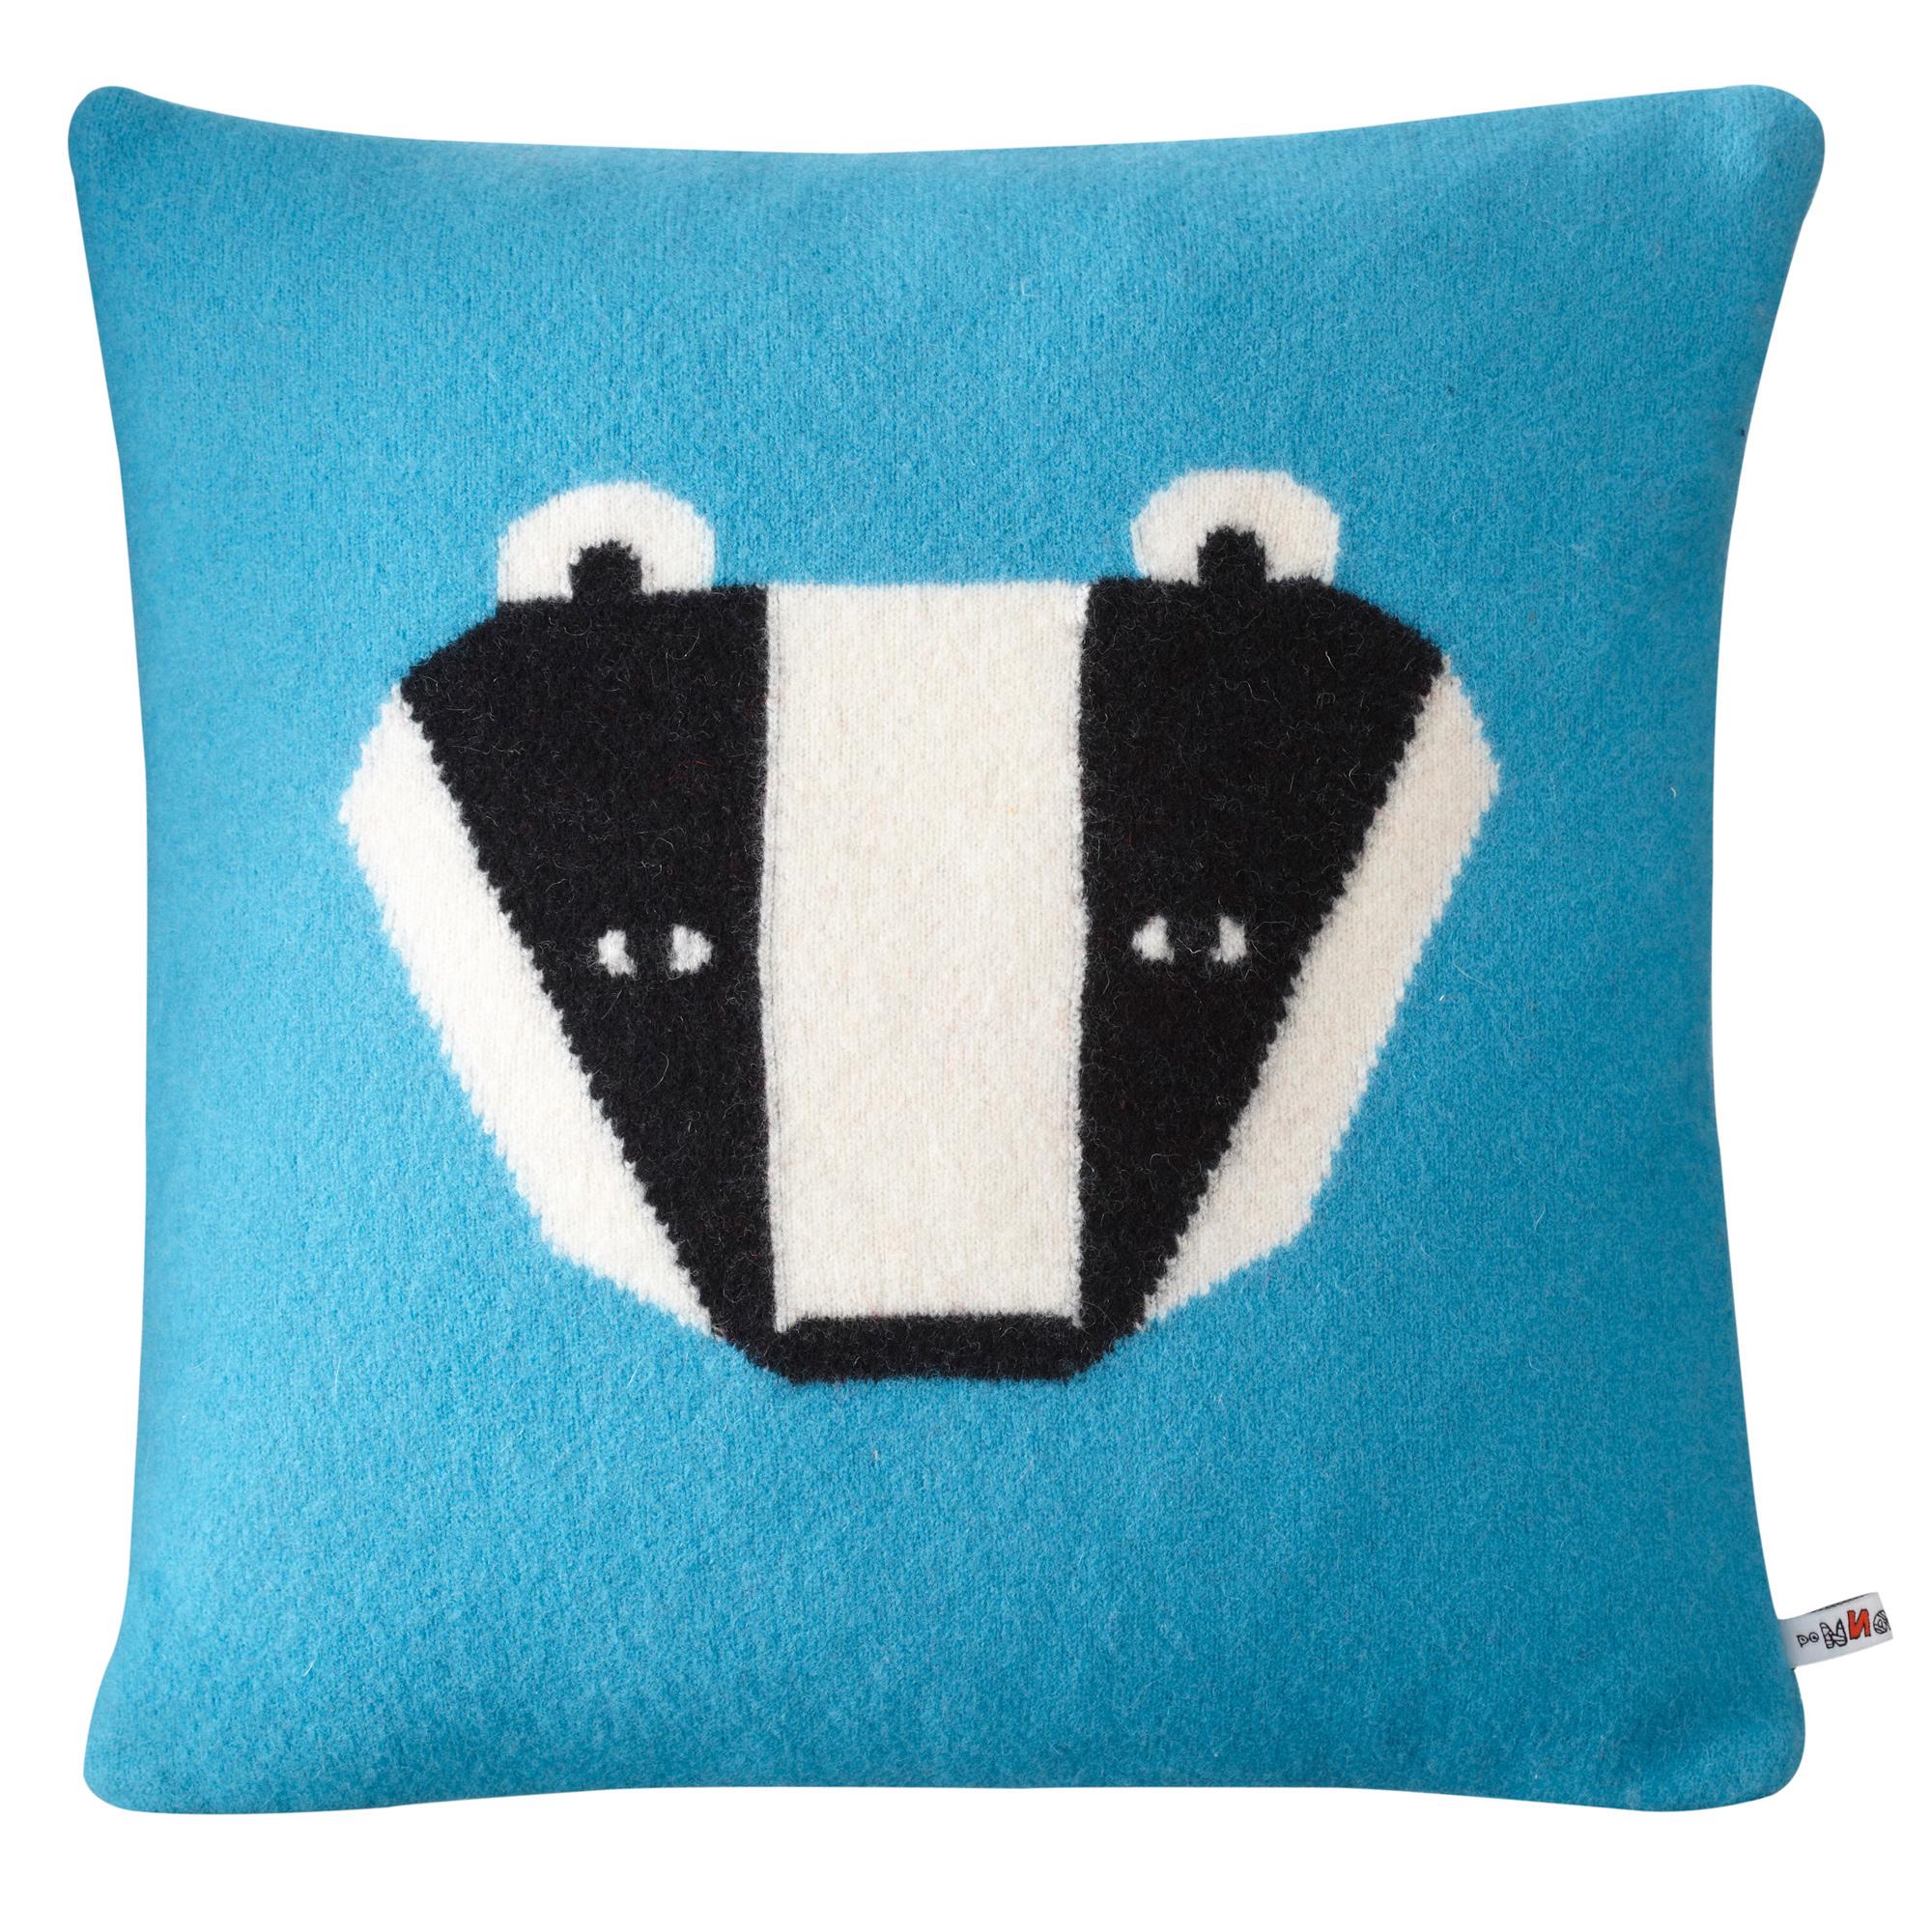 badger cushion blue donna wilson